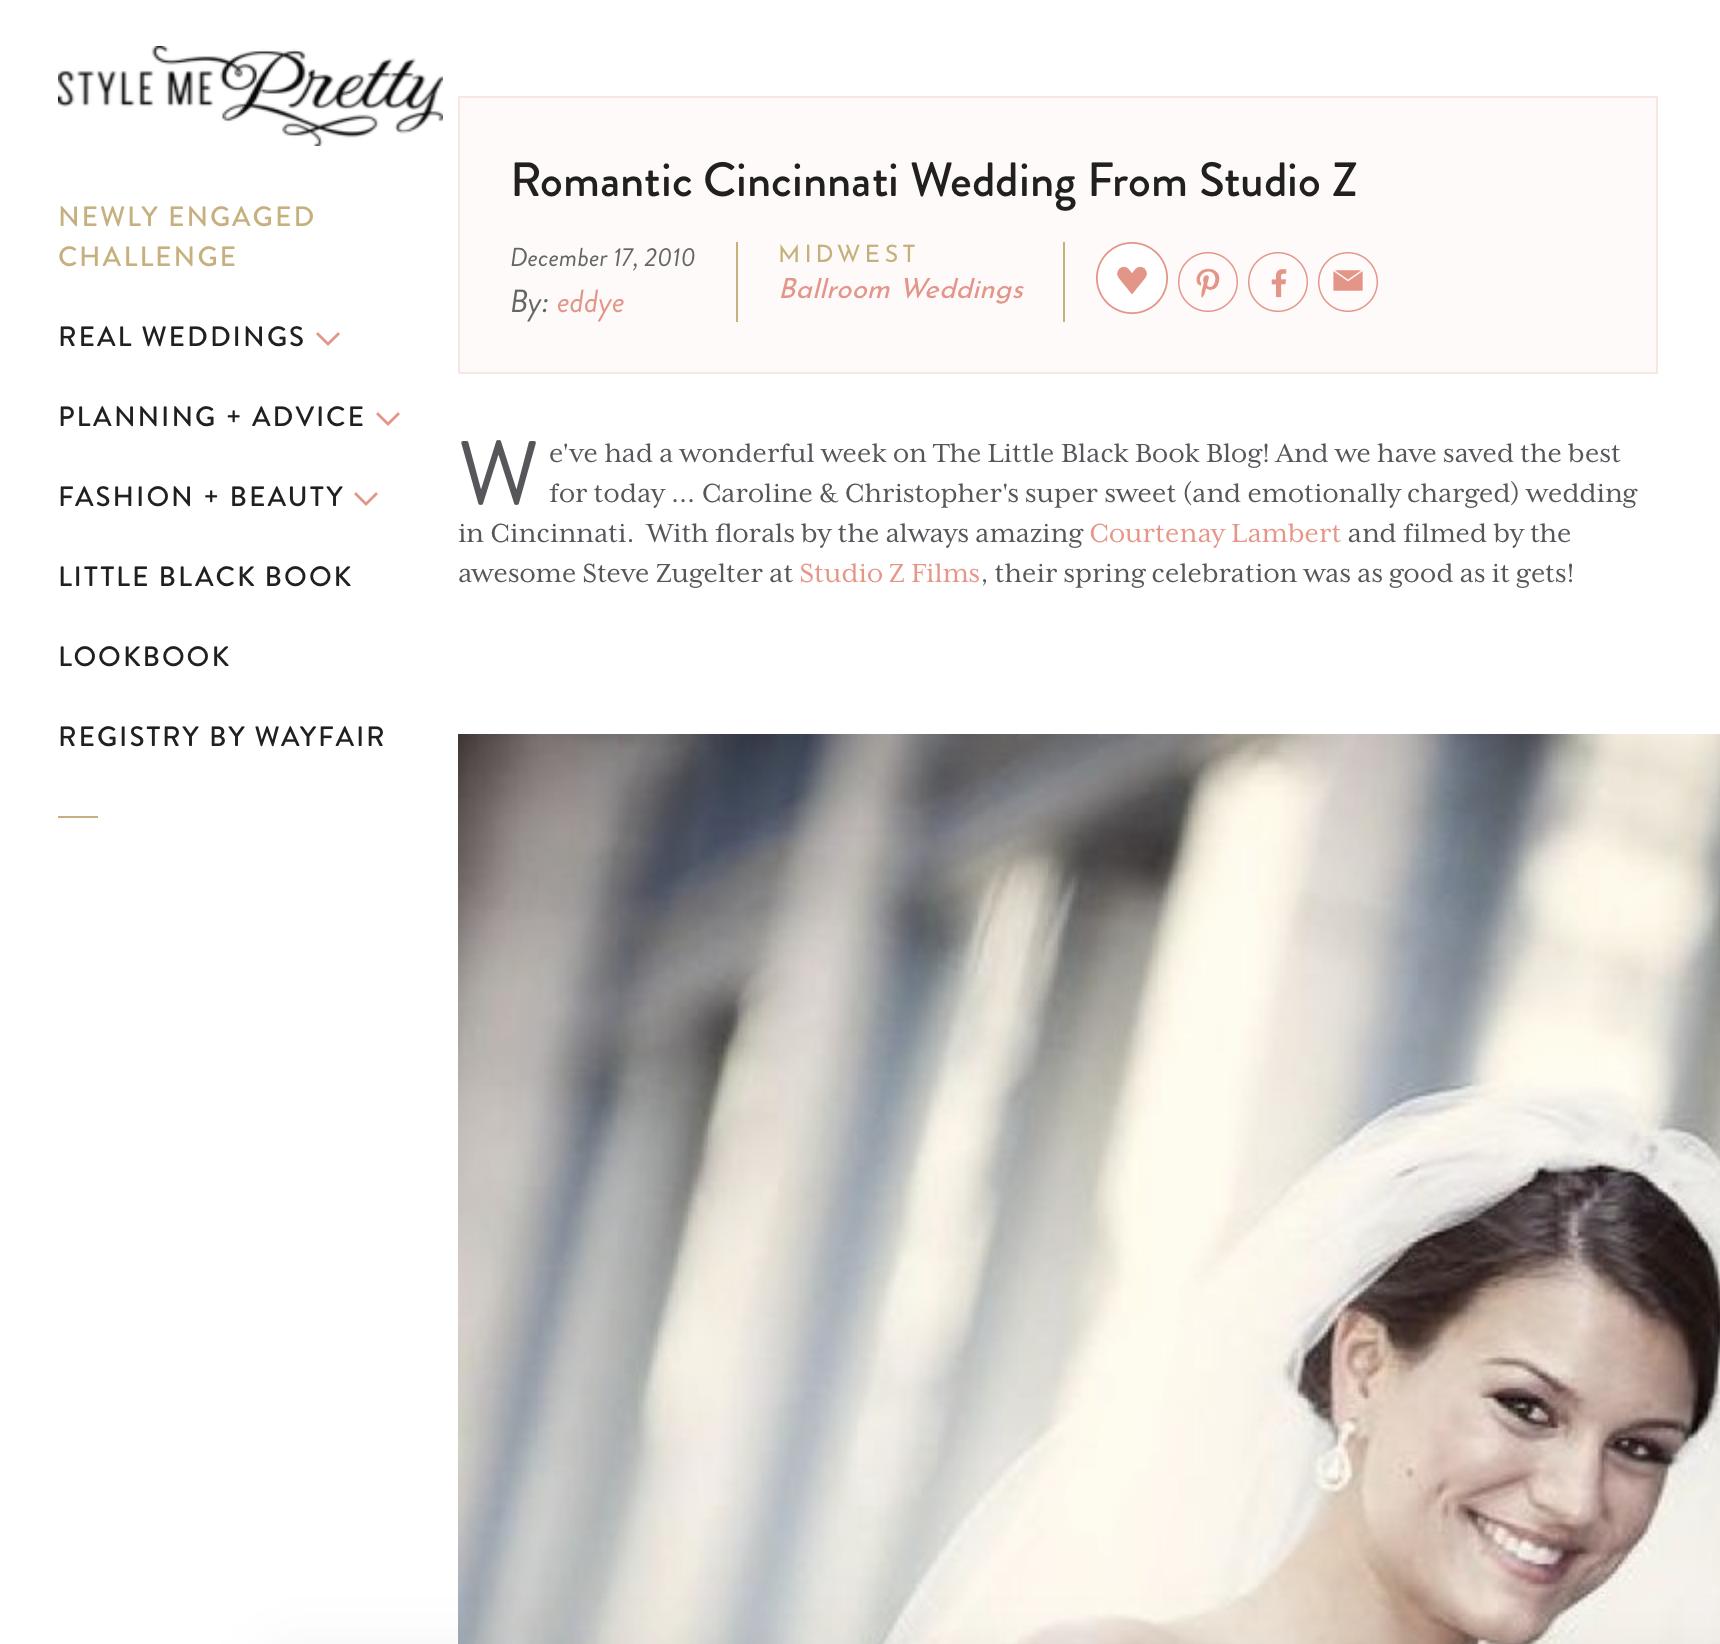 Romantic Hall of Mirrors Wedding